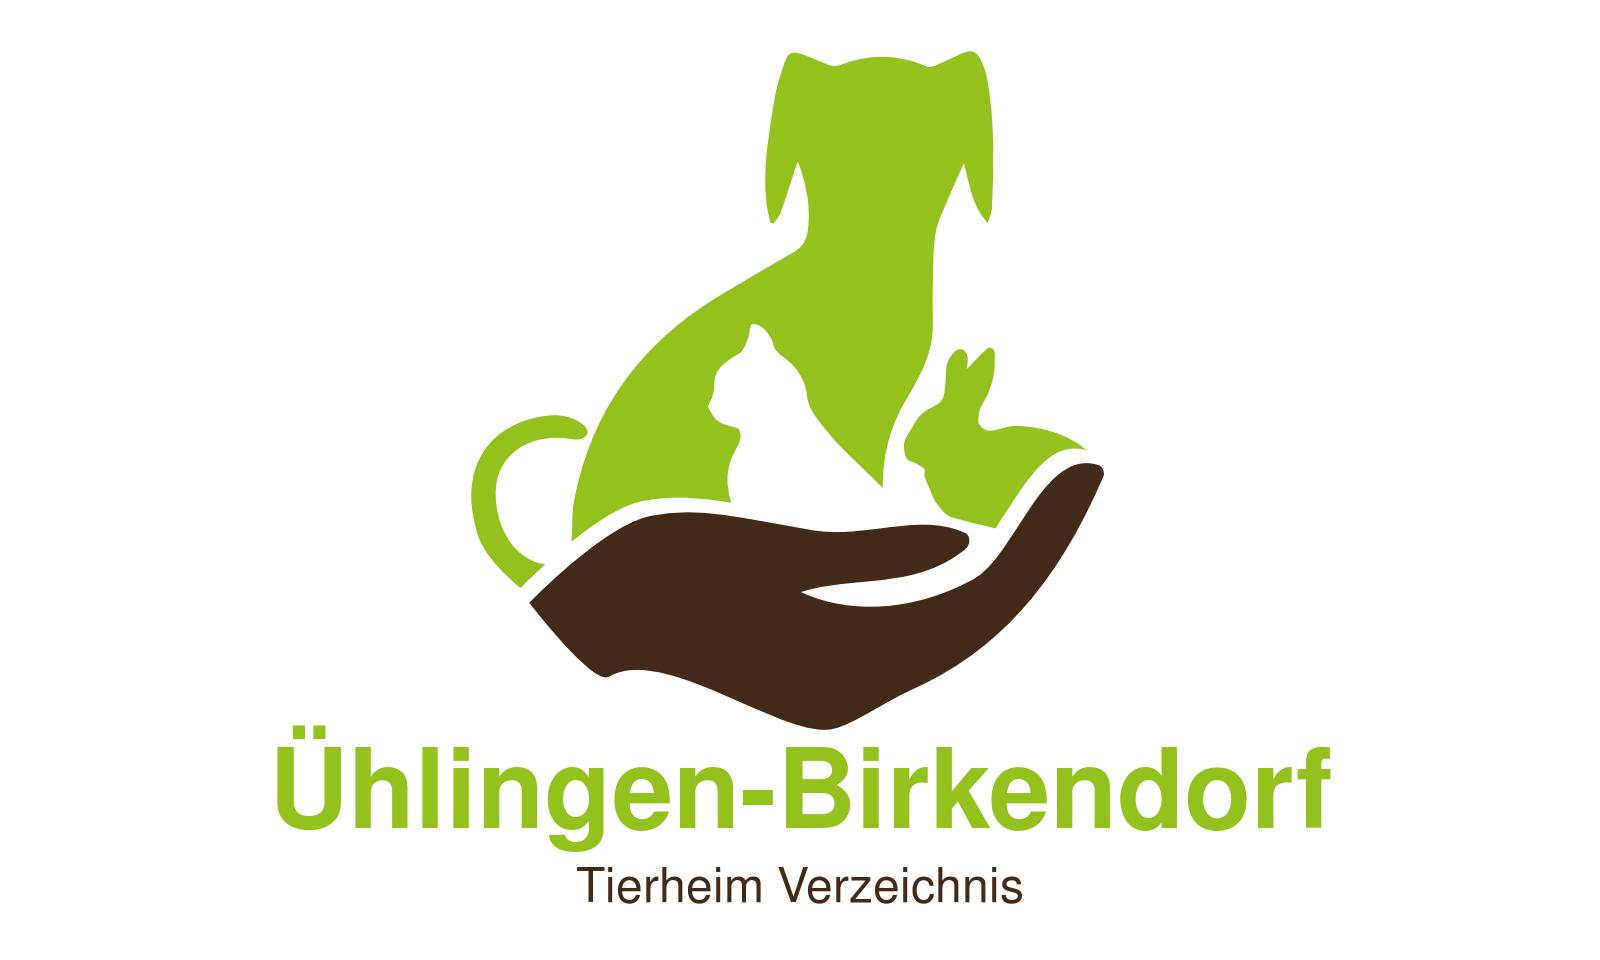 Tierheim Ühlingen-Birkendorf